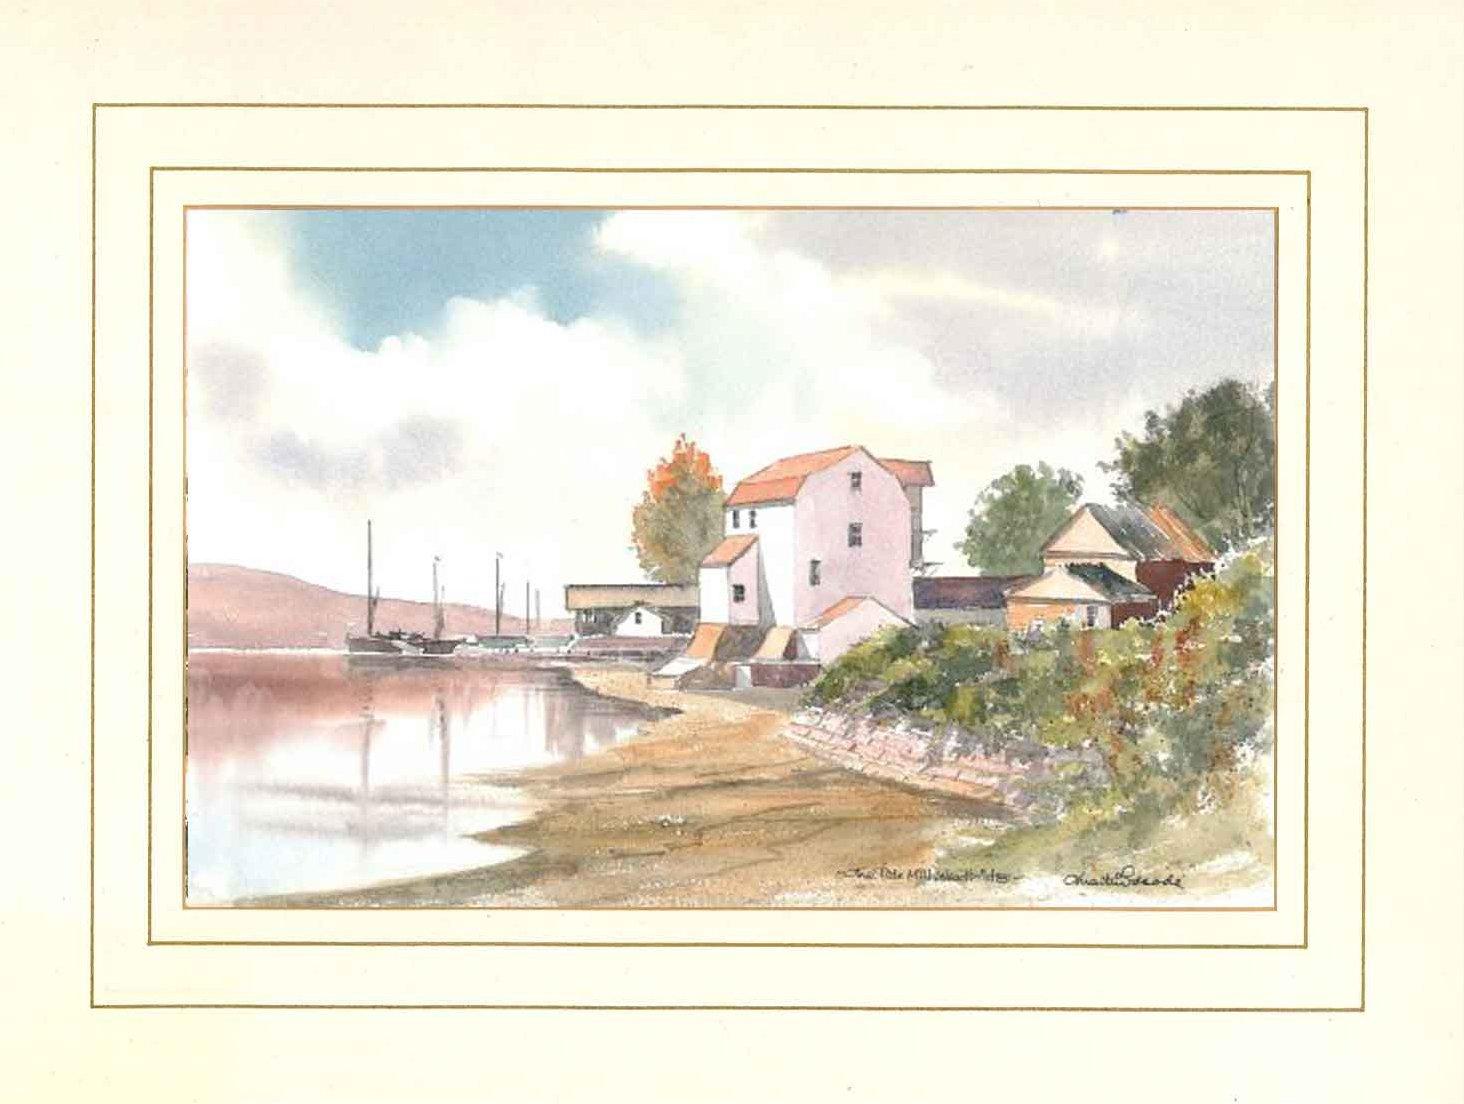 Tide Mill, Woodbridge, Suffolk, Original Watercolour Painting by Martin Goode